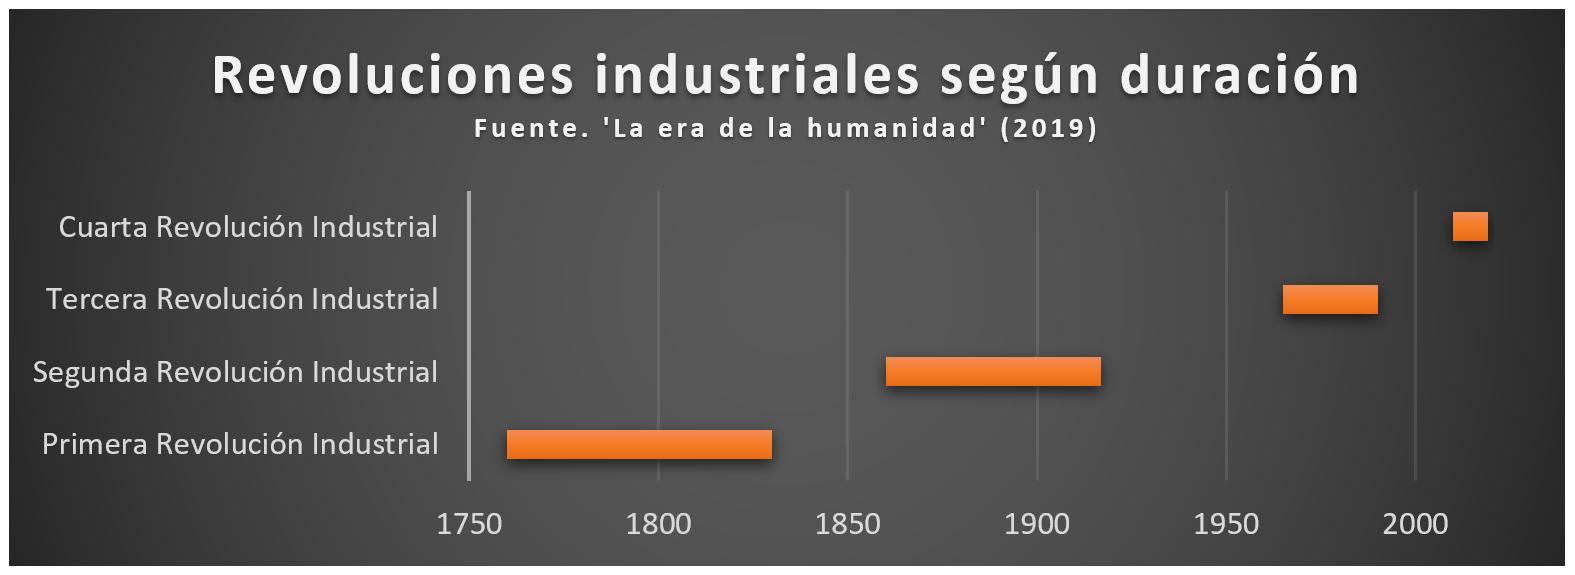 revoluciones industriales segun duracion